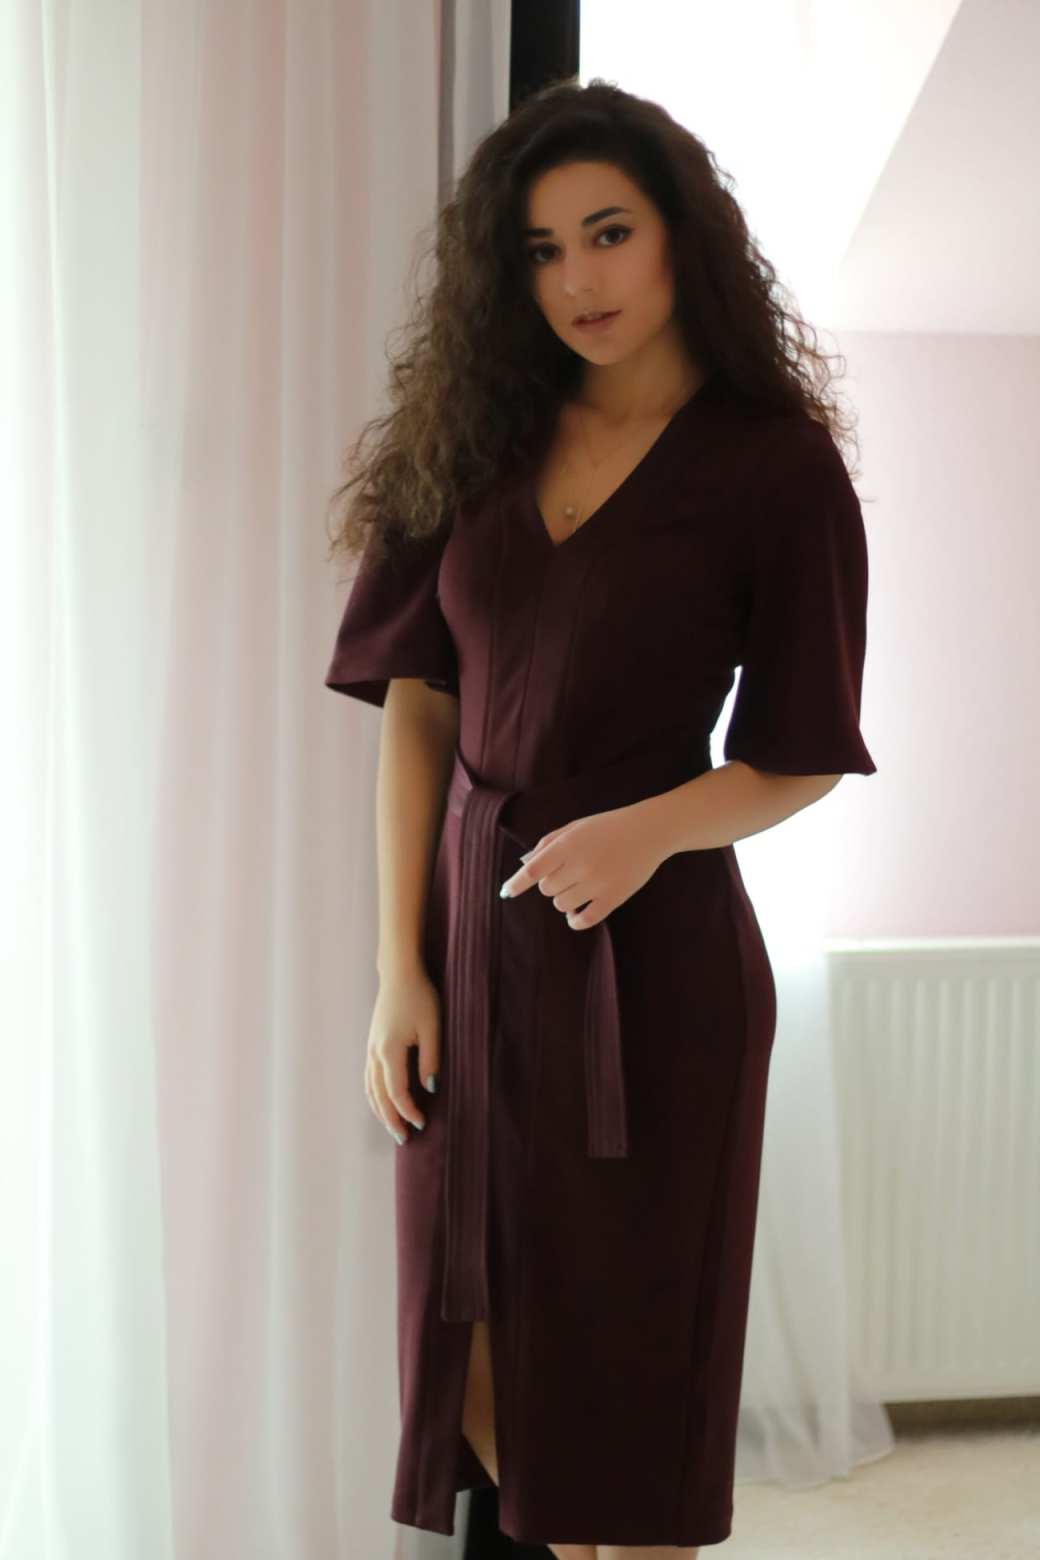 rochie visinie dama burgundy dress womanfashion.ro calitate quality material